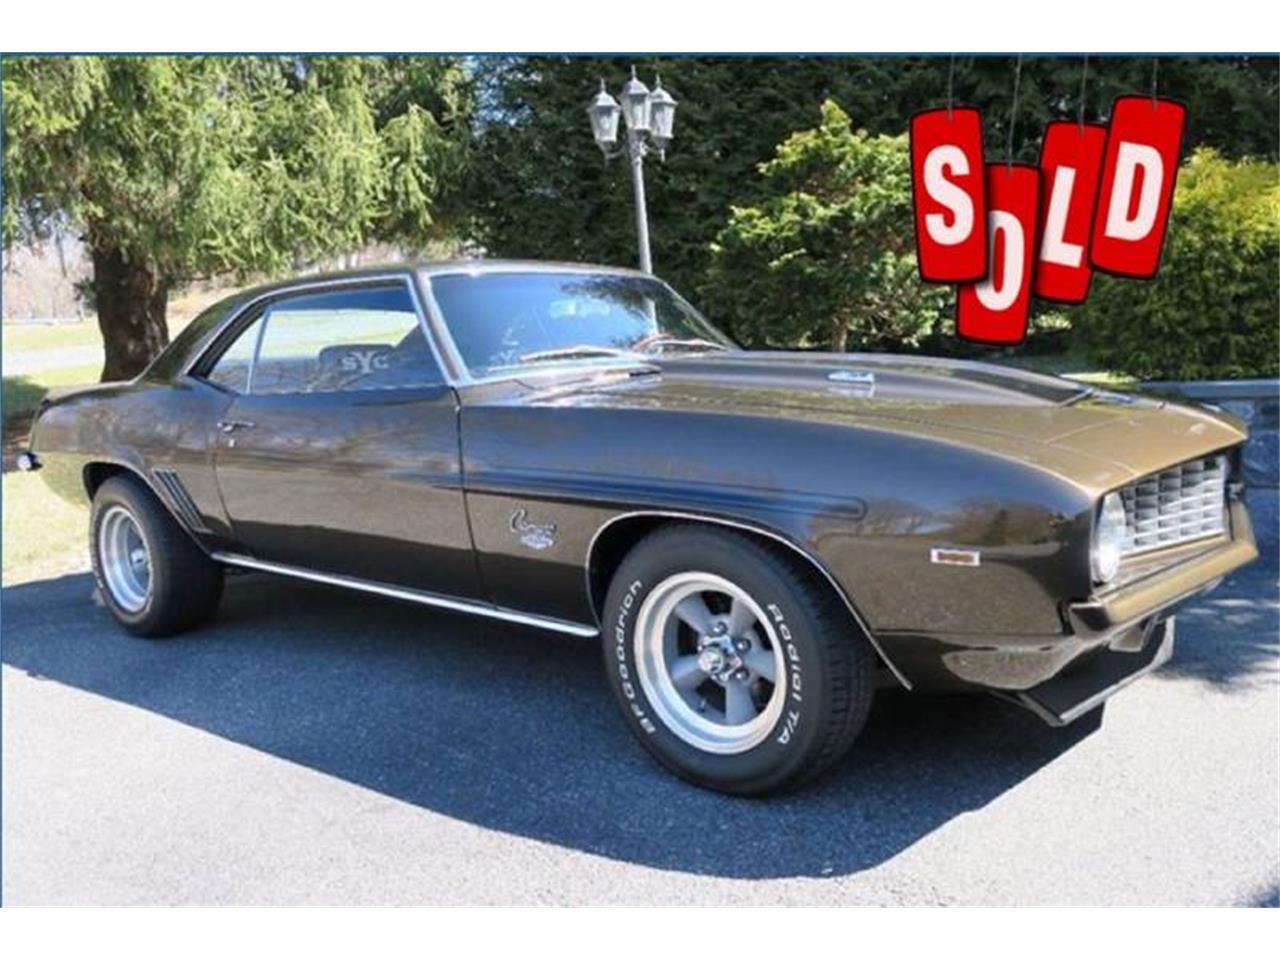 Yenko Camaro For Sale >> For Sale 1969 Chevrolet Camaro Yenko In Clarksburg Maryland